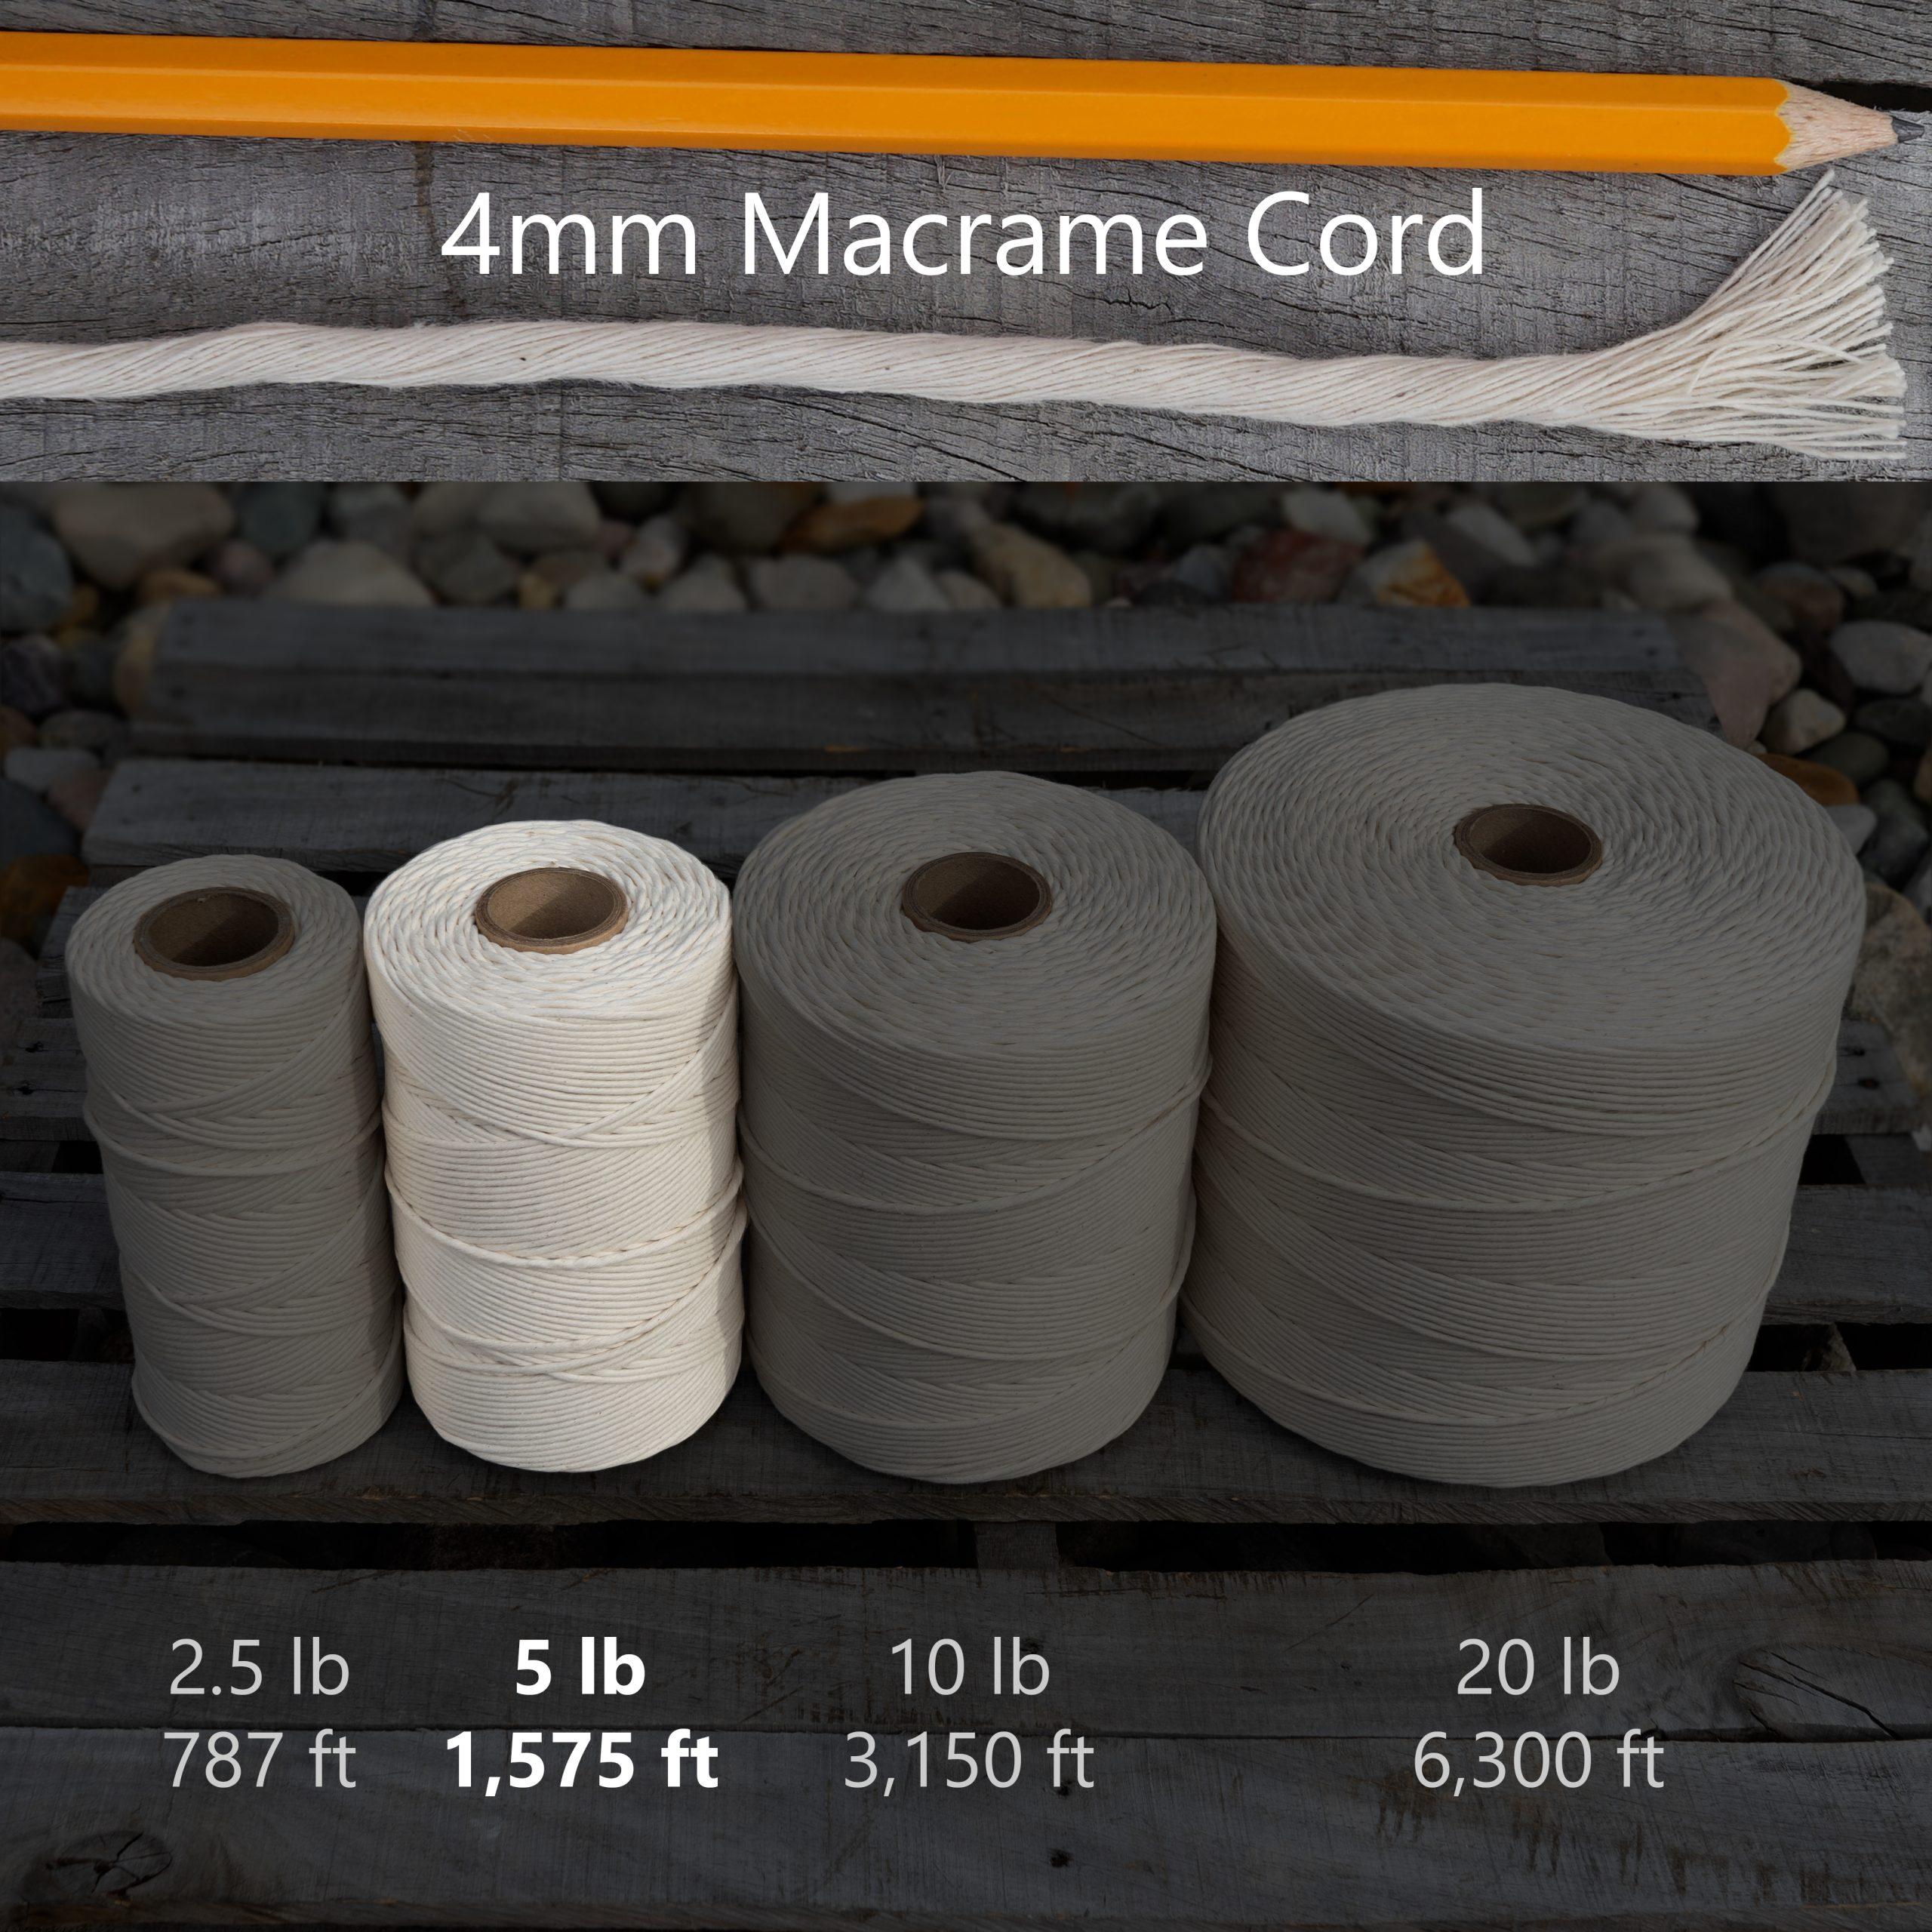 4 mm x 5 lb macrame tube